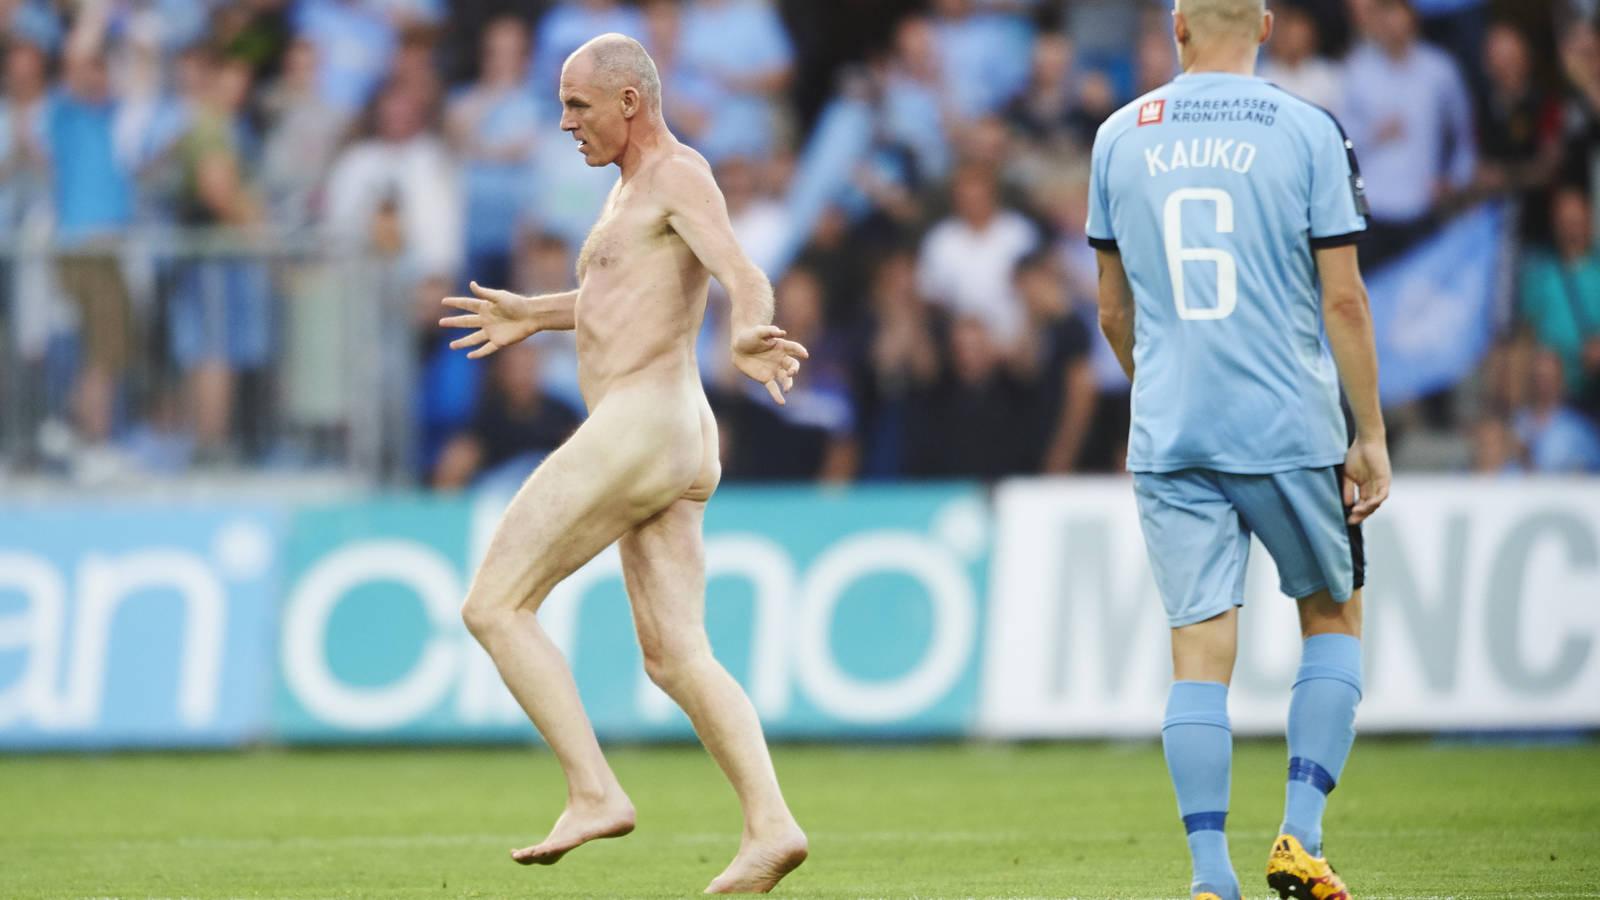 Oud Feyenoorder En Ek Held Rent Naakt Over Het Veld Nos